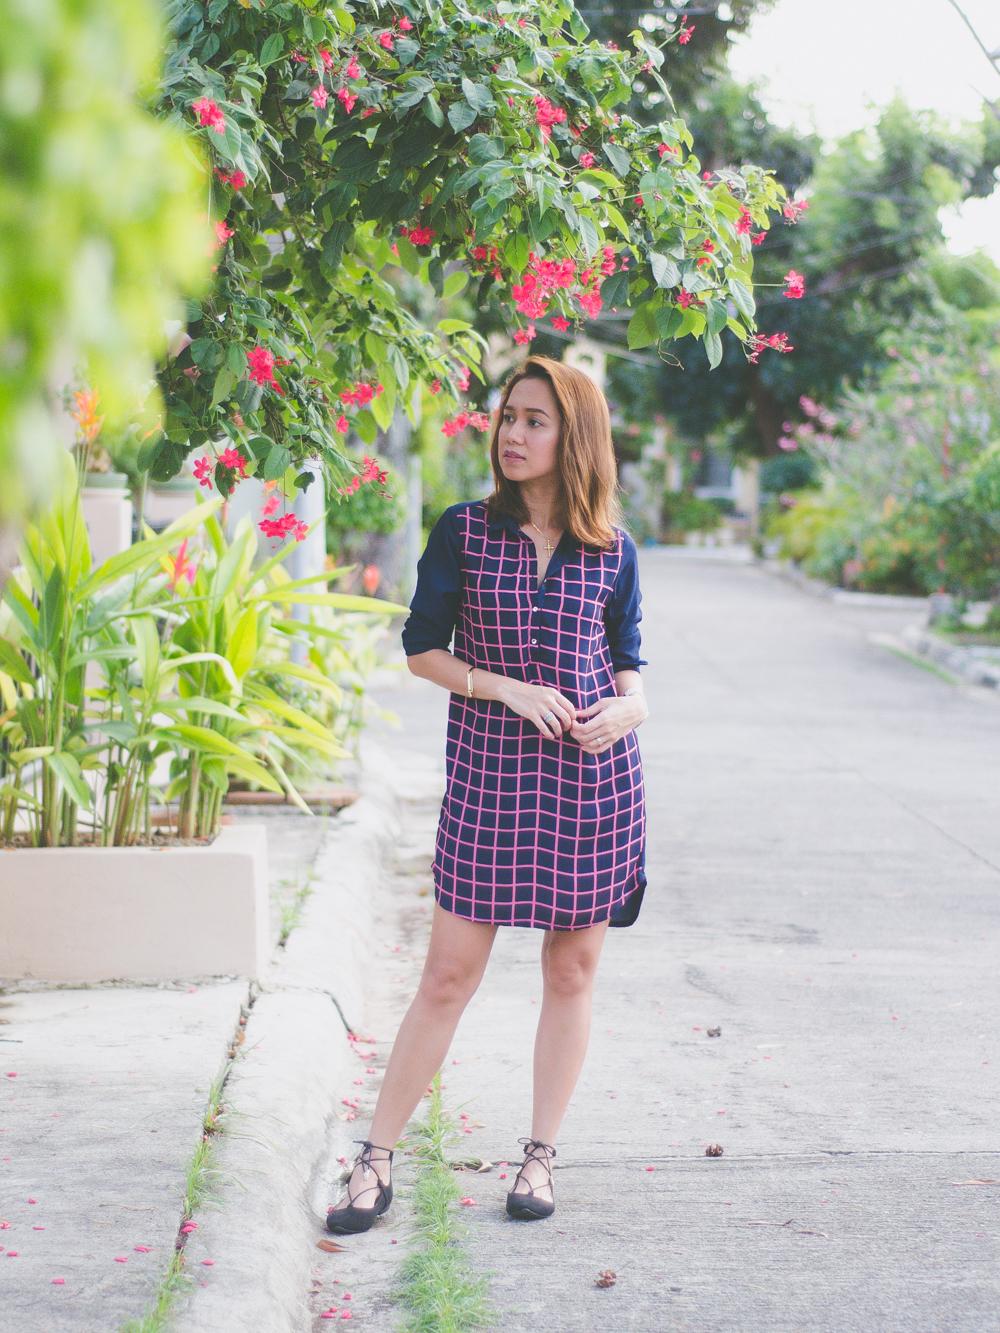 Cebu Fashion Blogger, Cebu Fashion Blog, Cebu Blogger, Cebu Bloggers, Memo Philippines, Shift Dress, Memo Shift Dress, Summer Dresses, Easy Pieces for Summer, Summer Outfit Ideas, Philippine Blogger, Asian Blogger, Cebu Lifestyle Blogger, SM Parisian, Lace-up flats